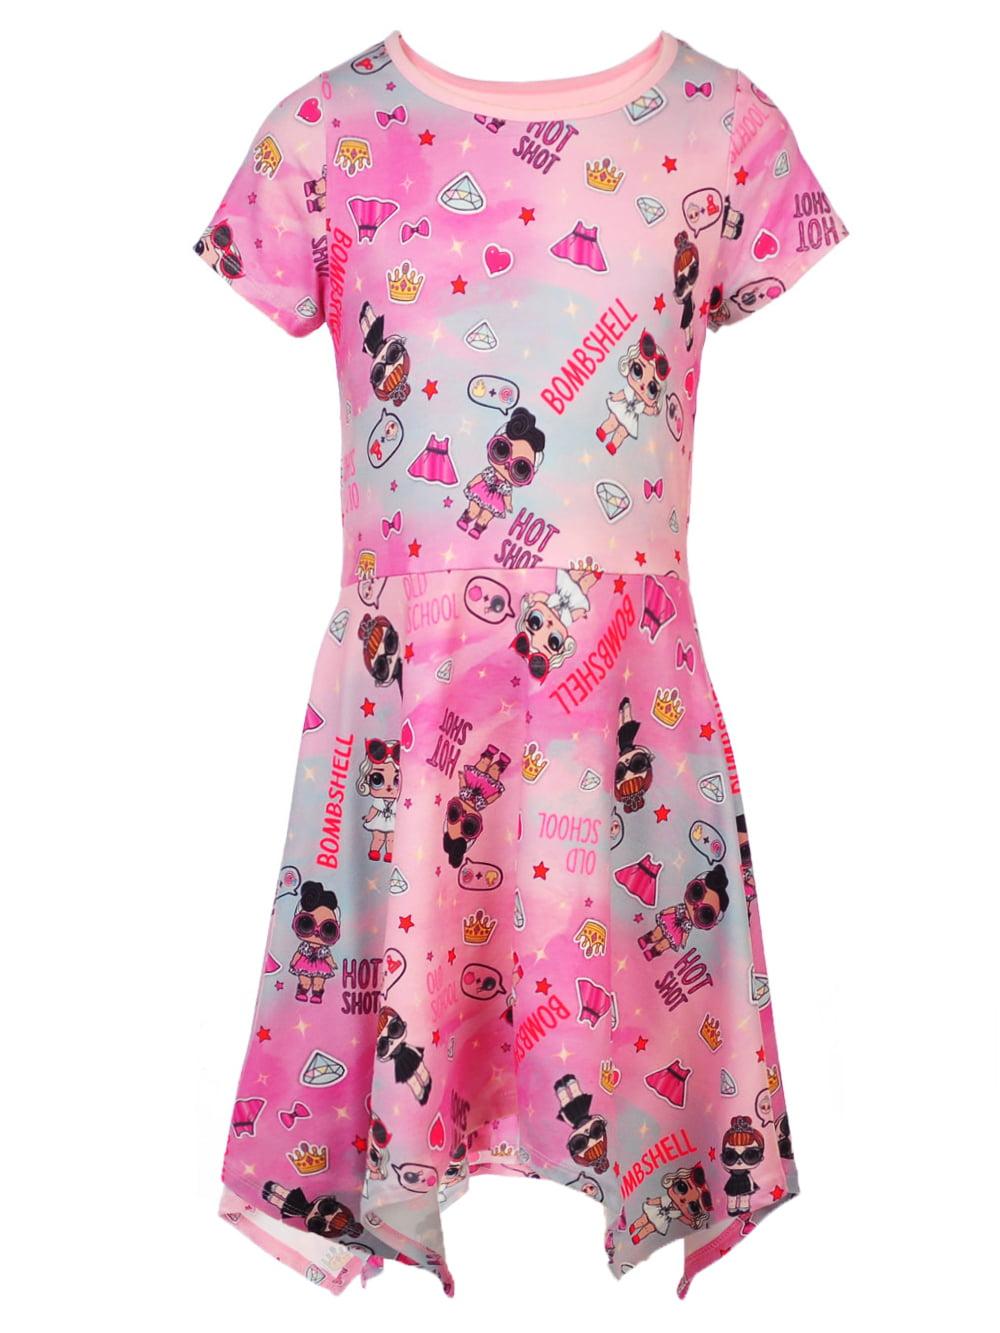 LOL Surprise Girls' Dress